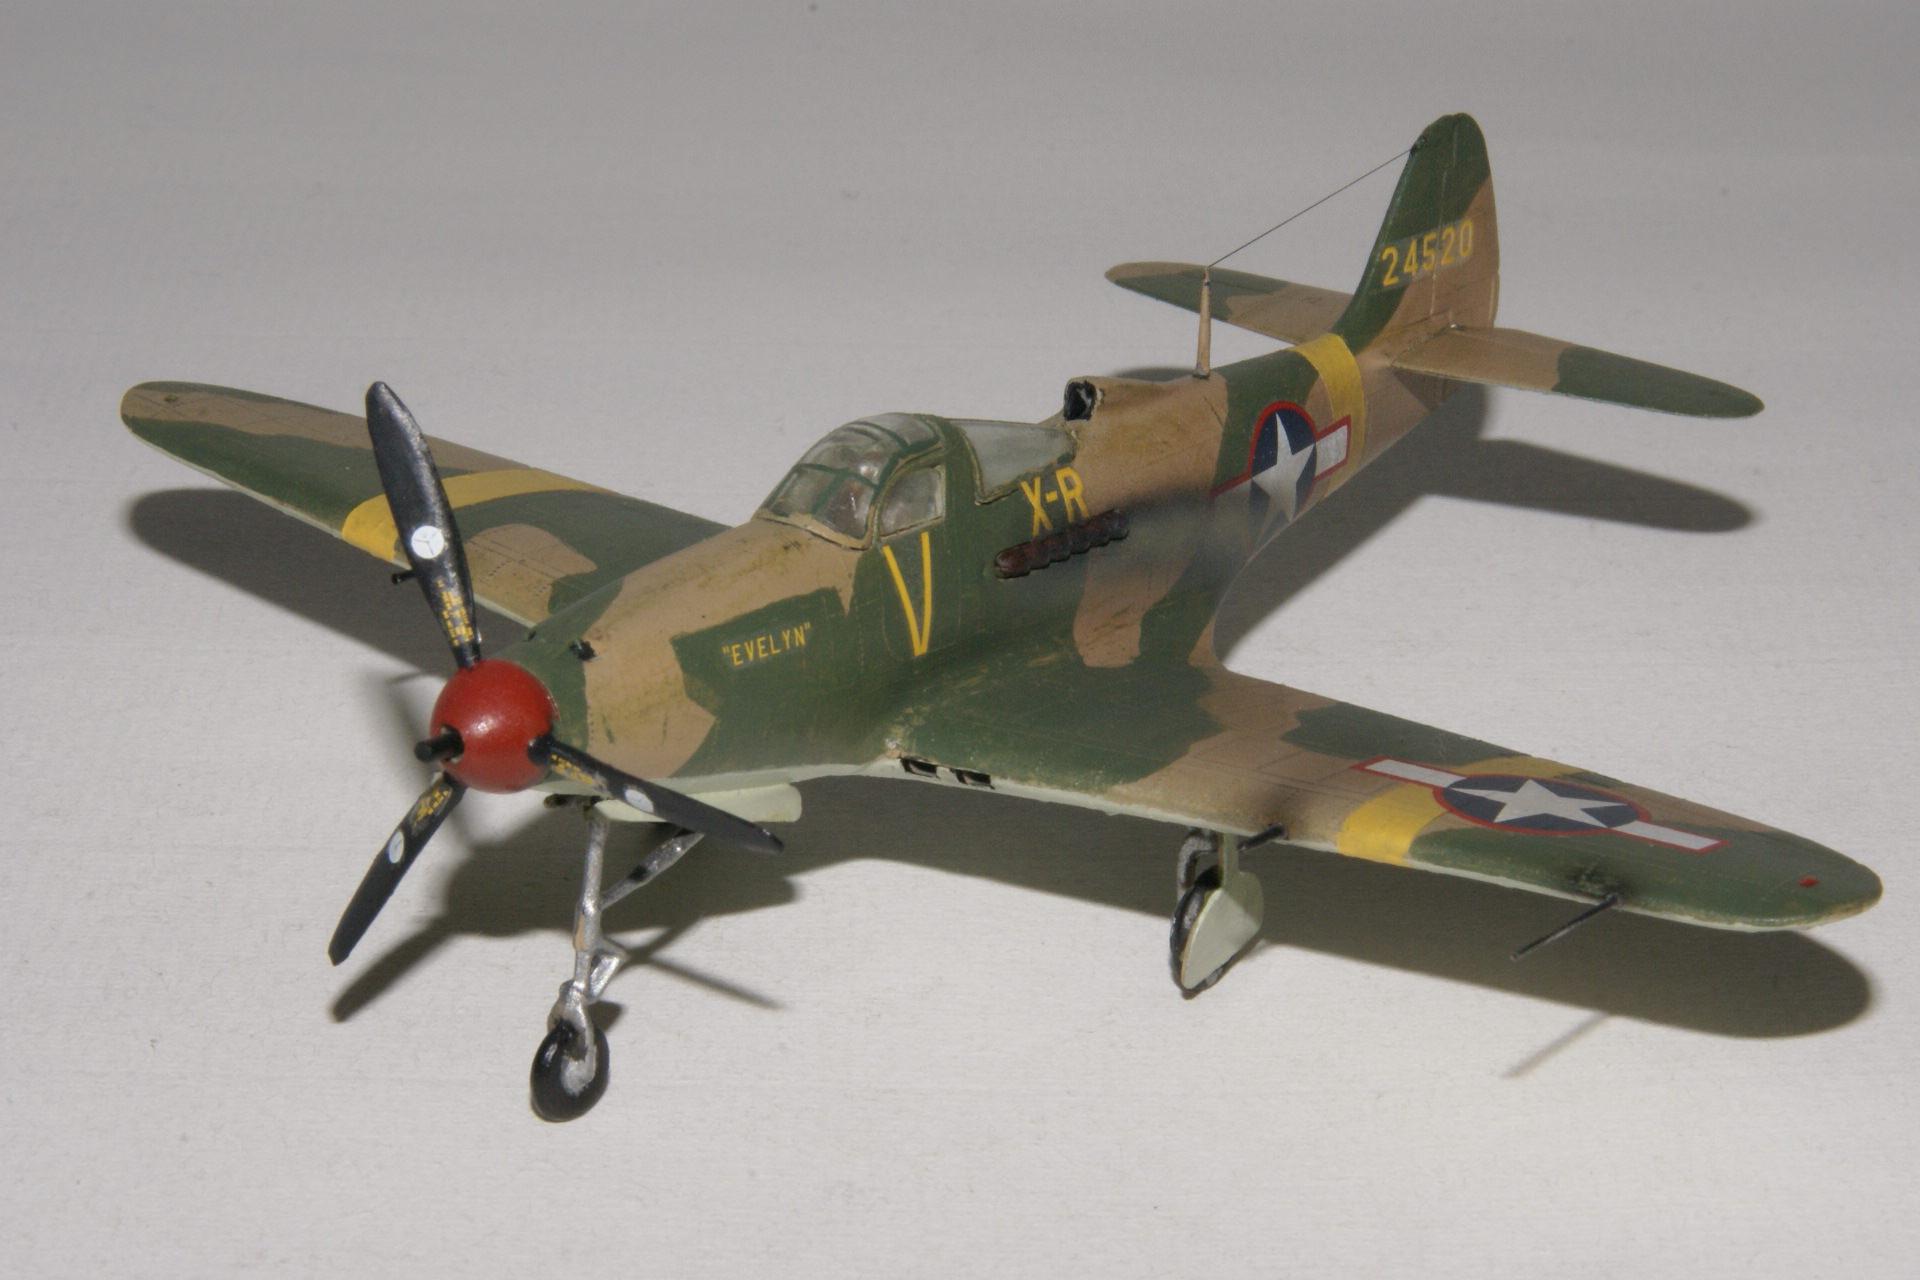 Bell p 39l airacobra 4 2